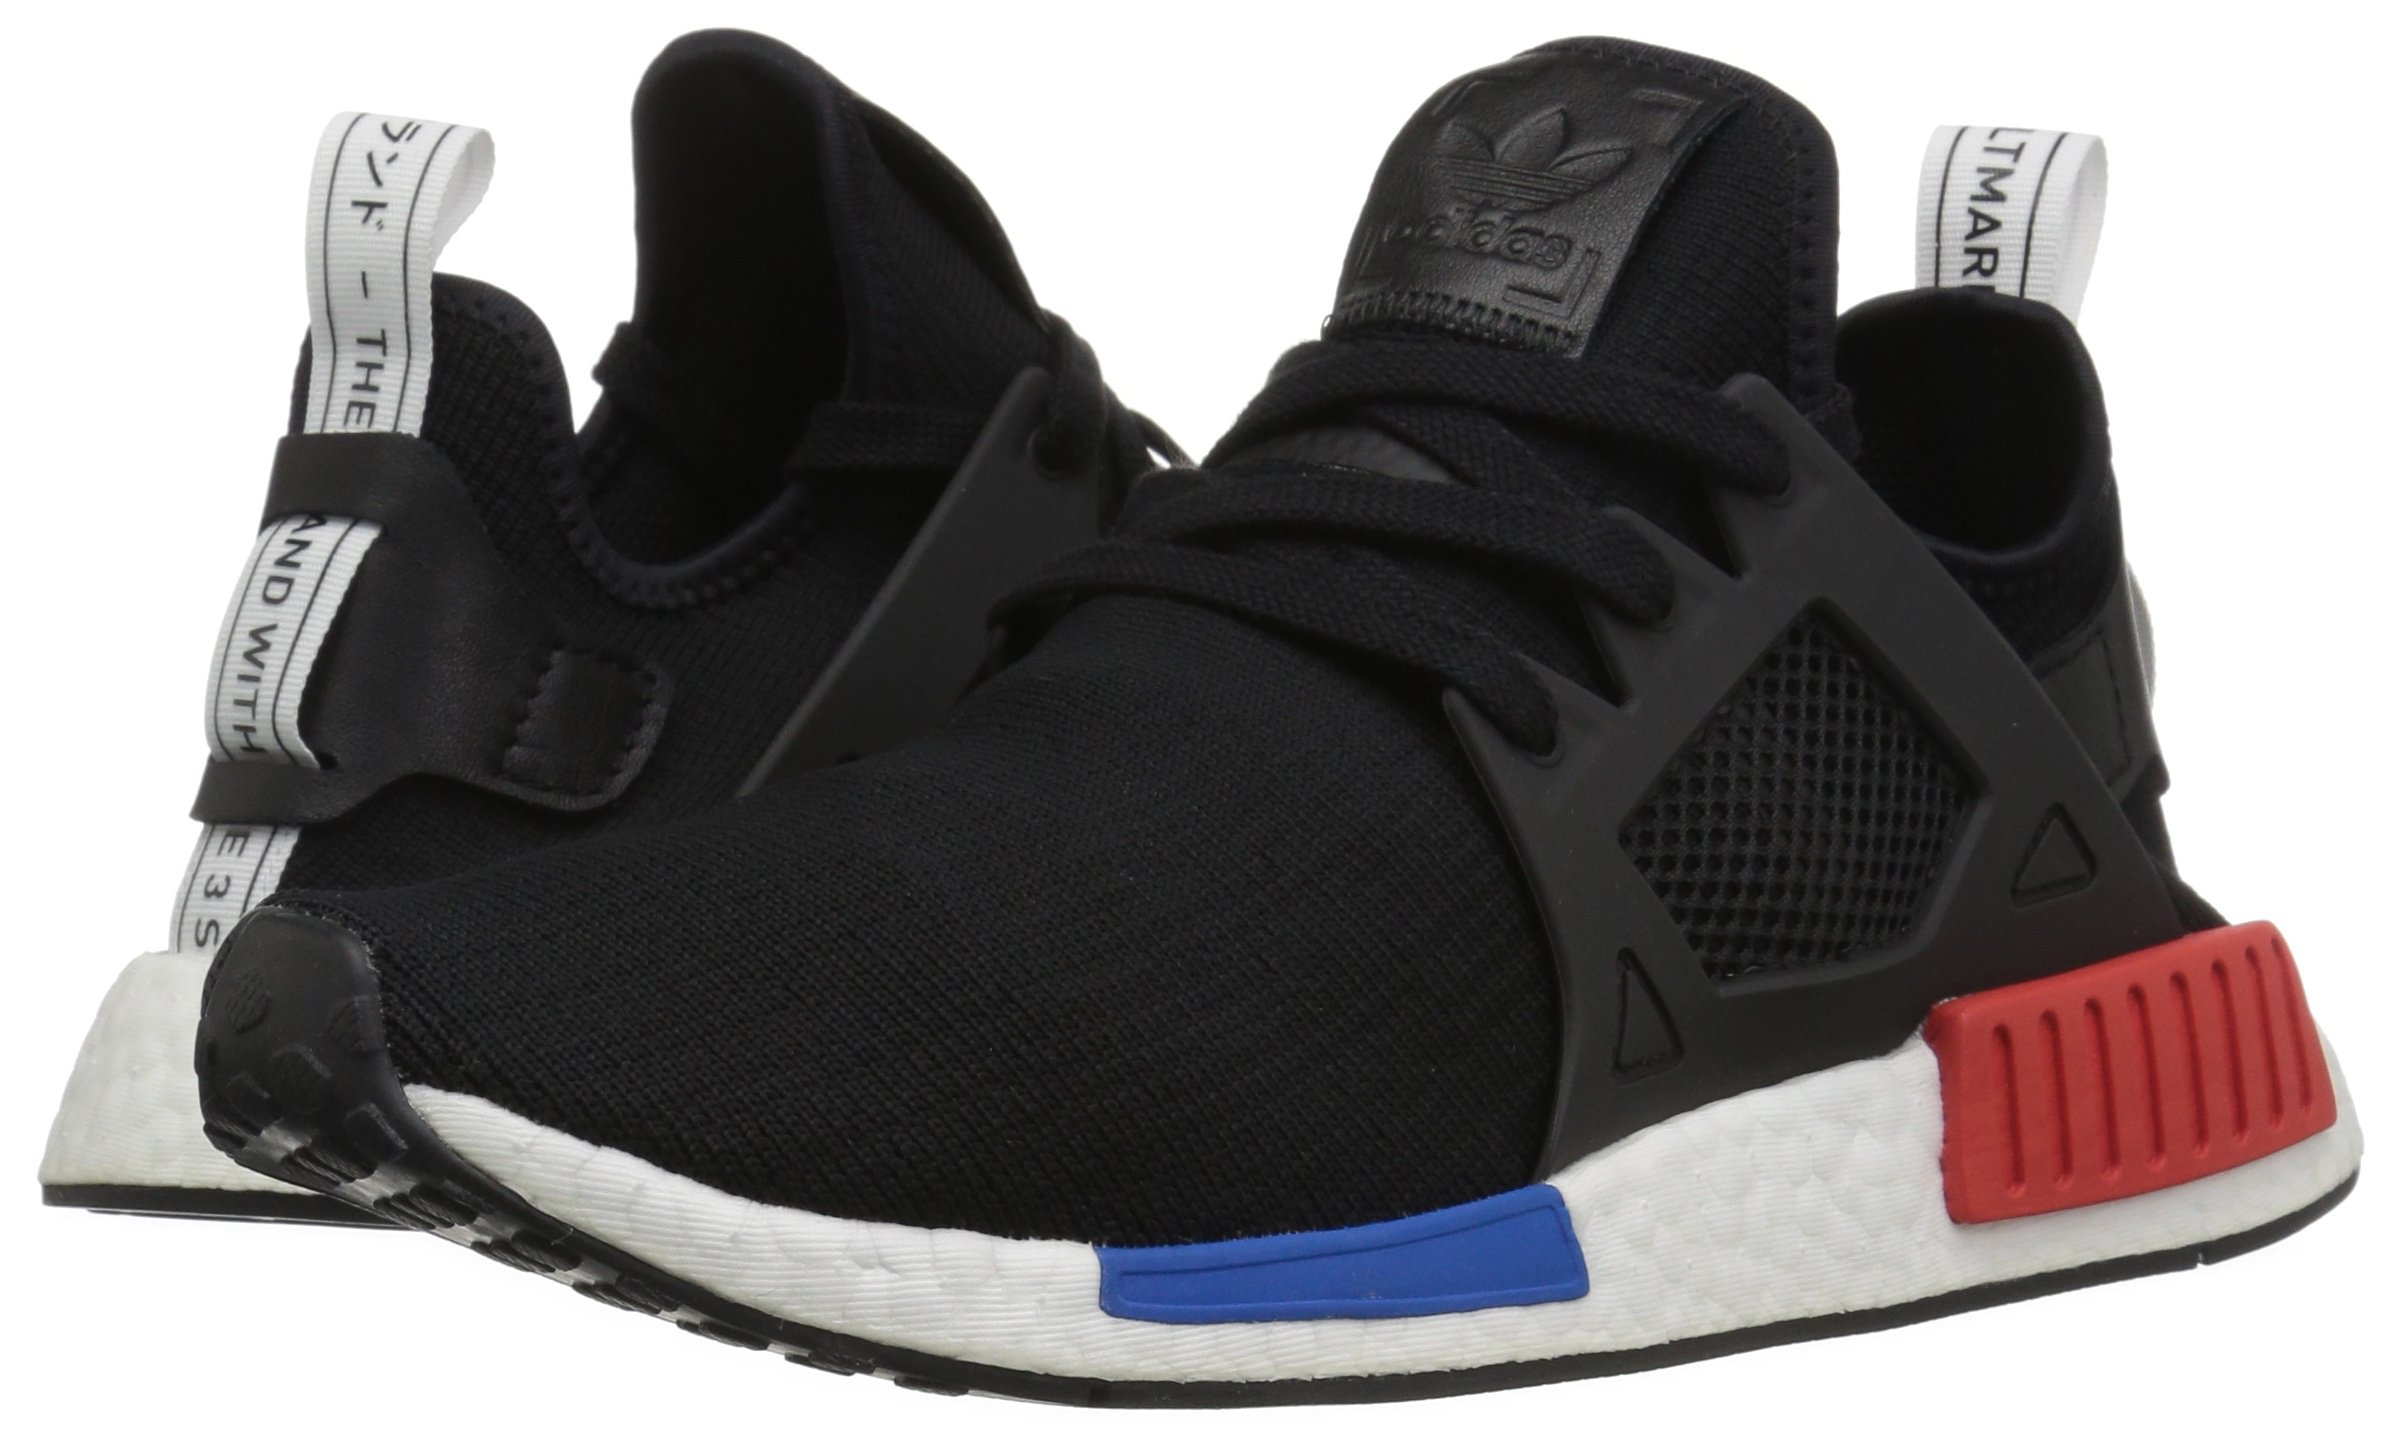 62fdf4bb8 adidas Originals Men s NMD XR1 PK Sneaker